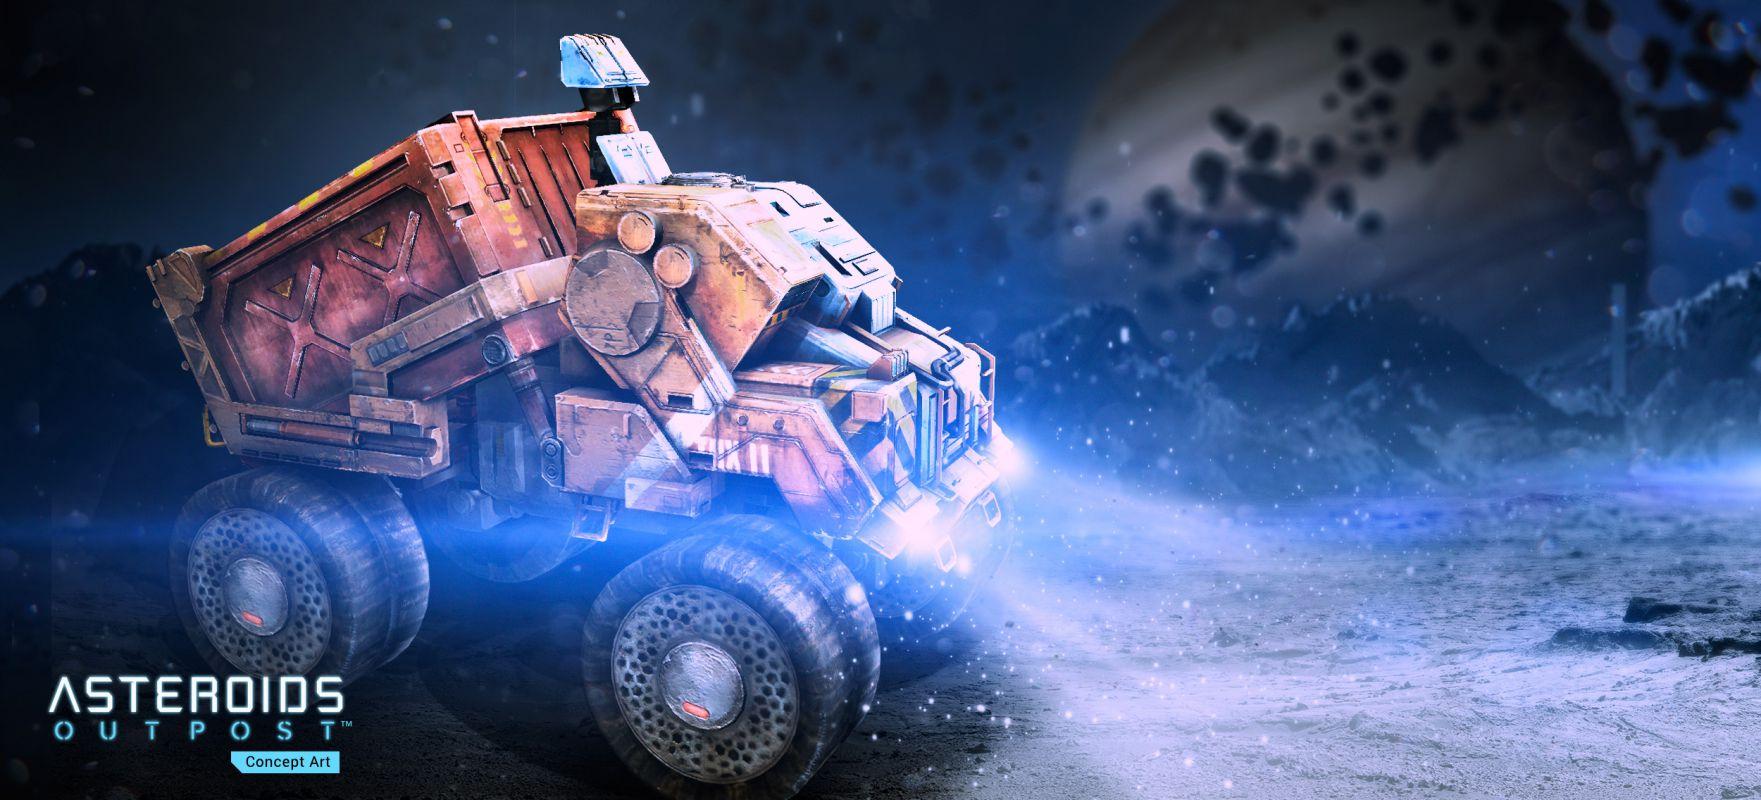 Asteroids: Outpost - Анонс новой